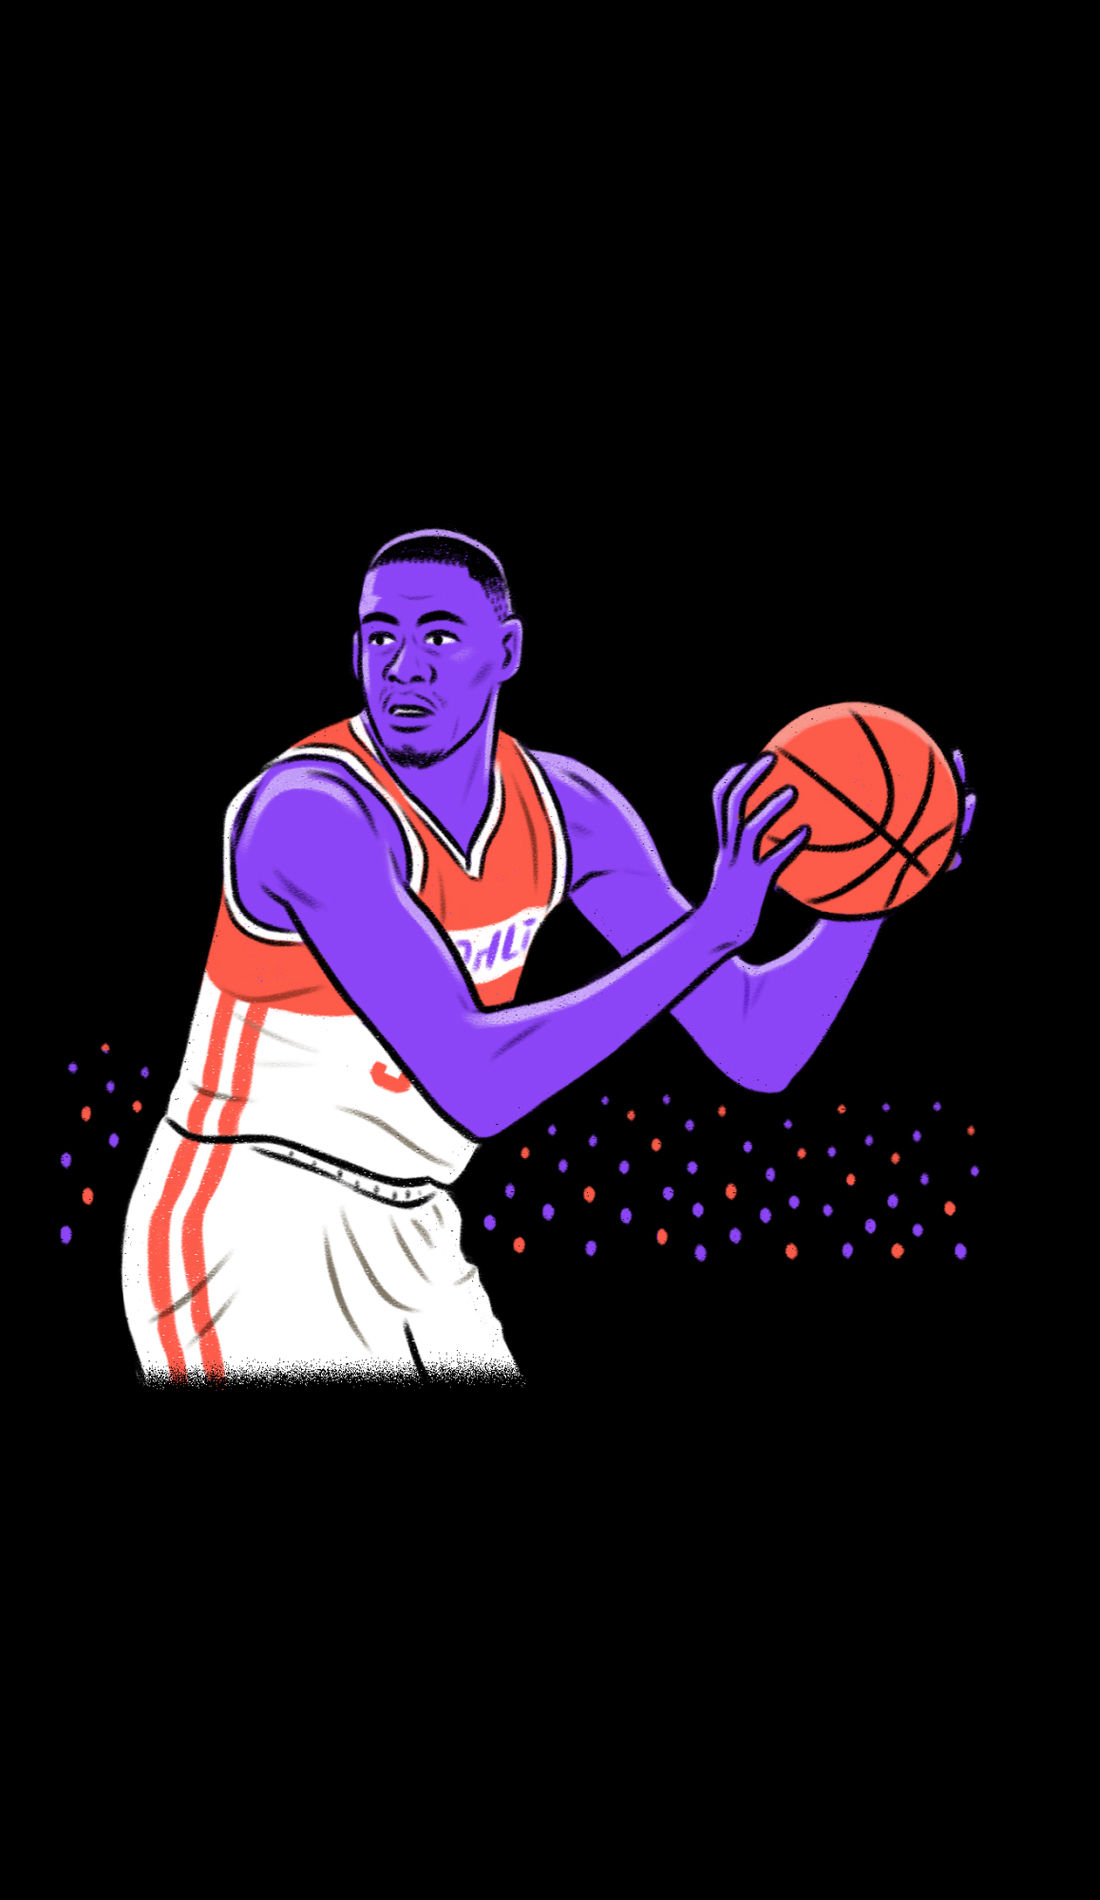 A Tulsa Golden Hurricane Basketball live event